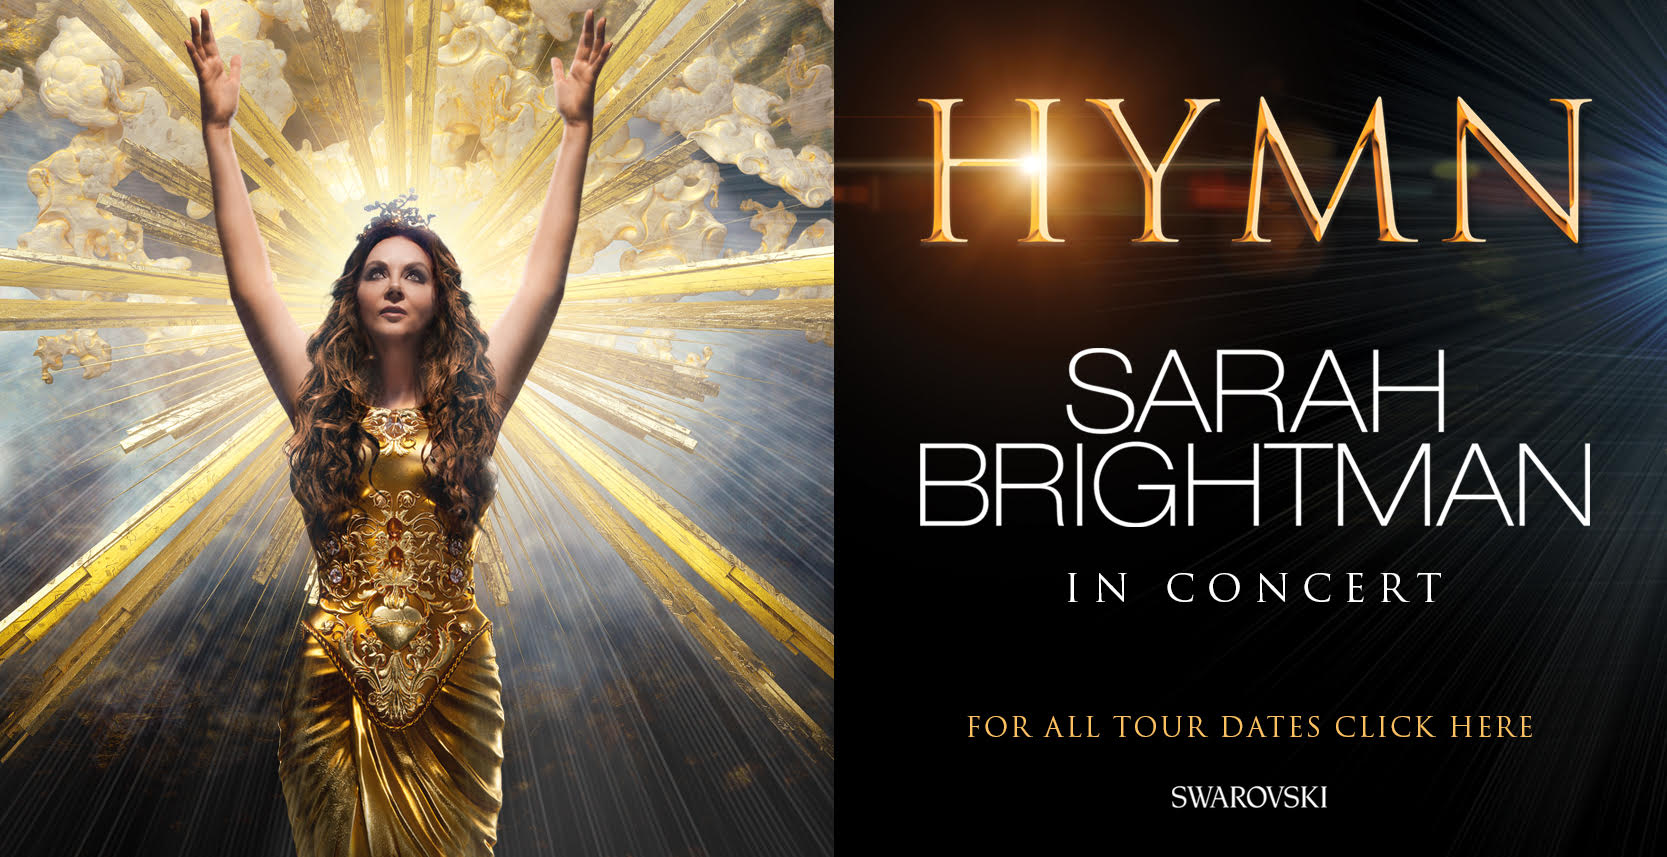 Home - Sarah Brightman : Sarah Brightman